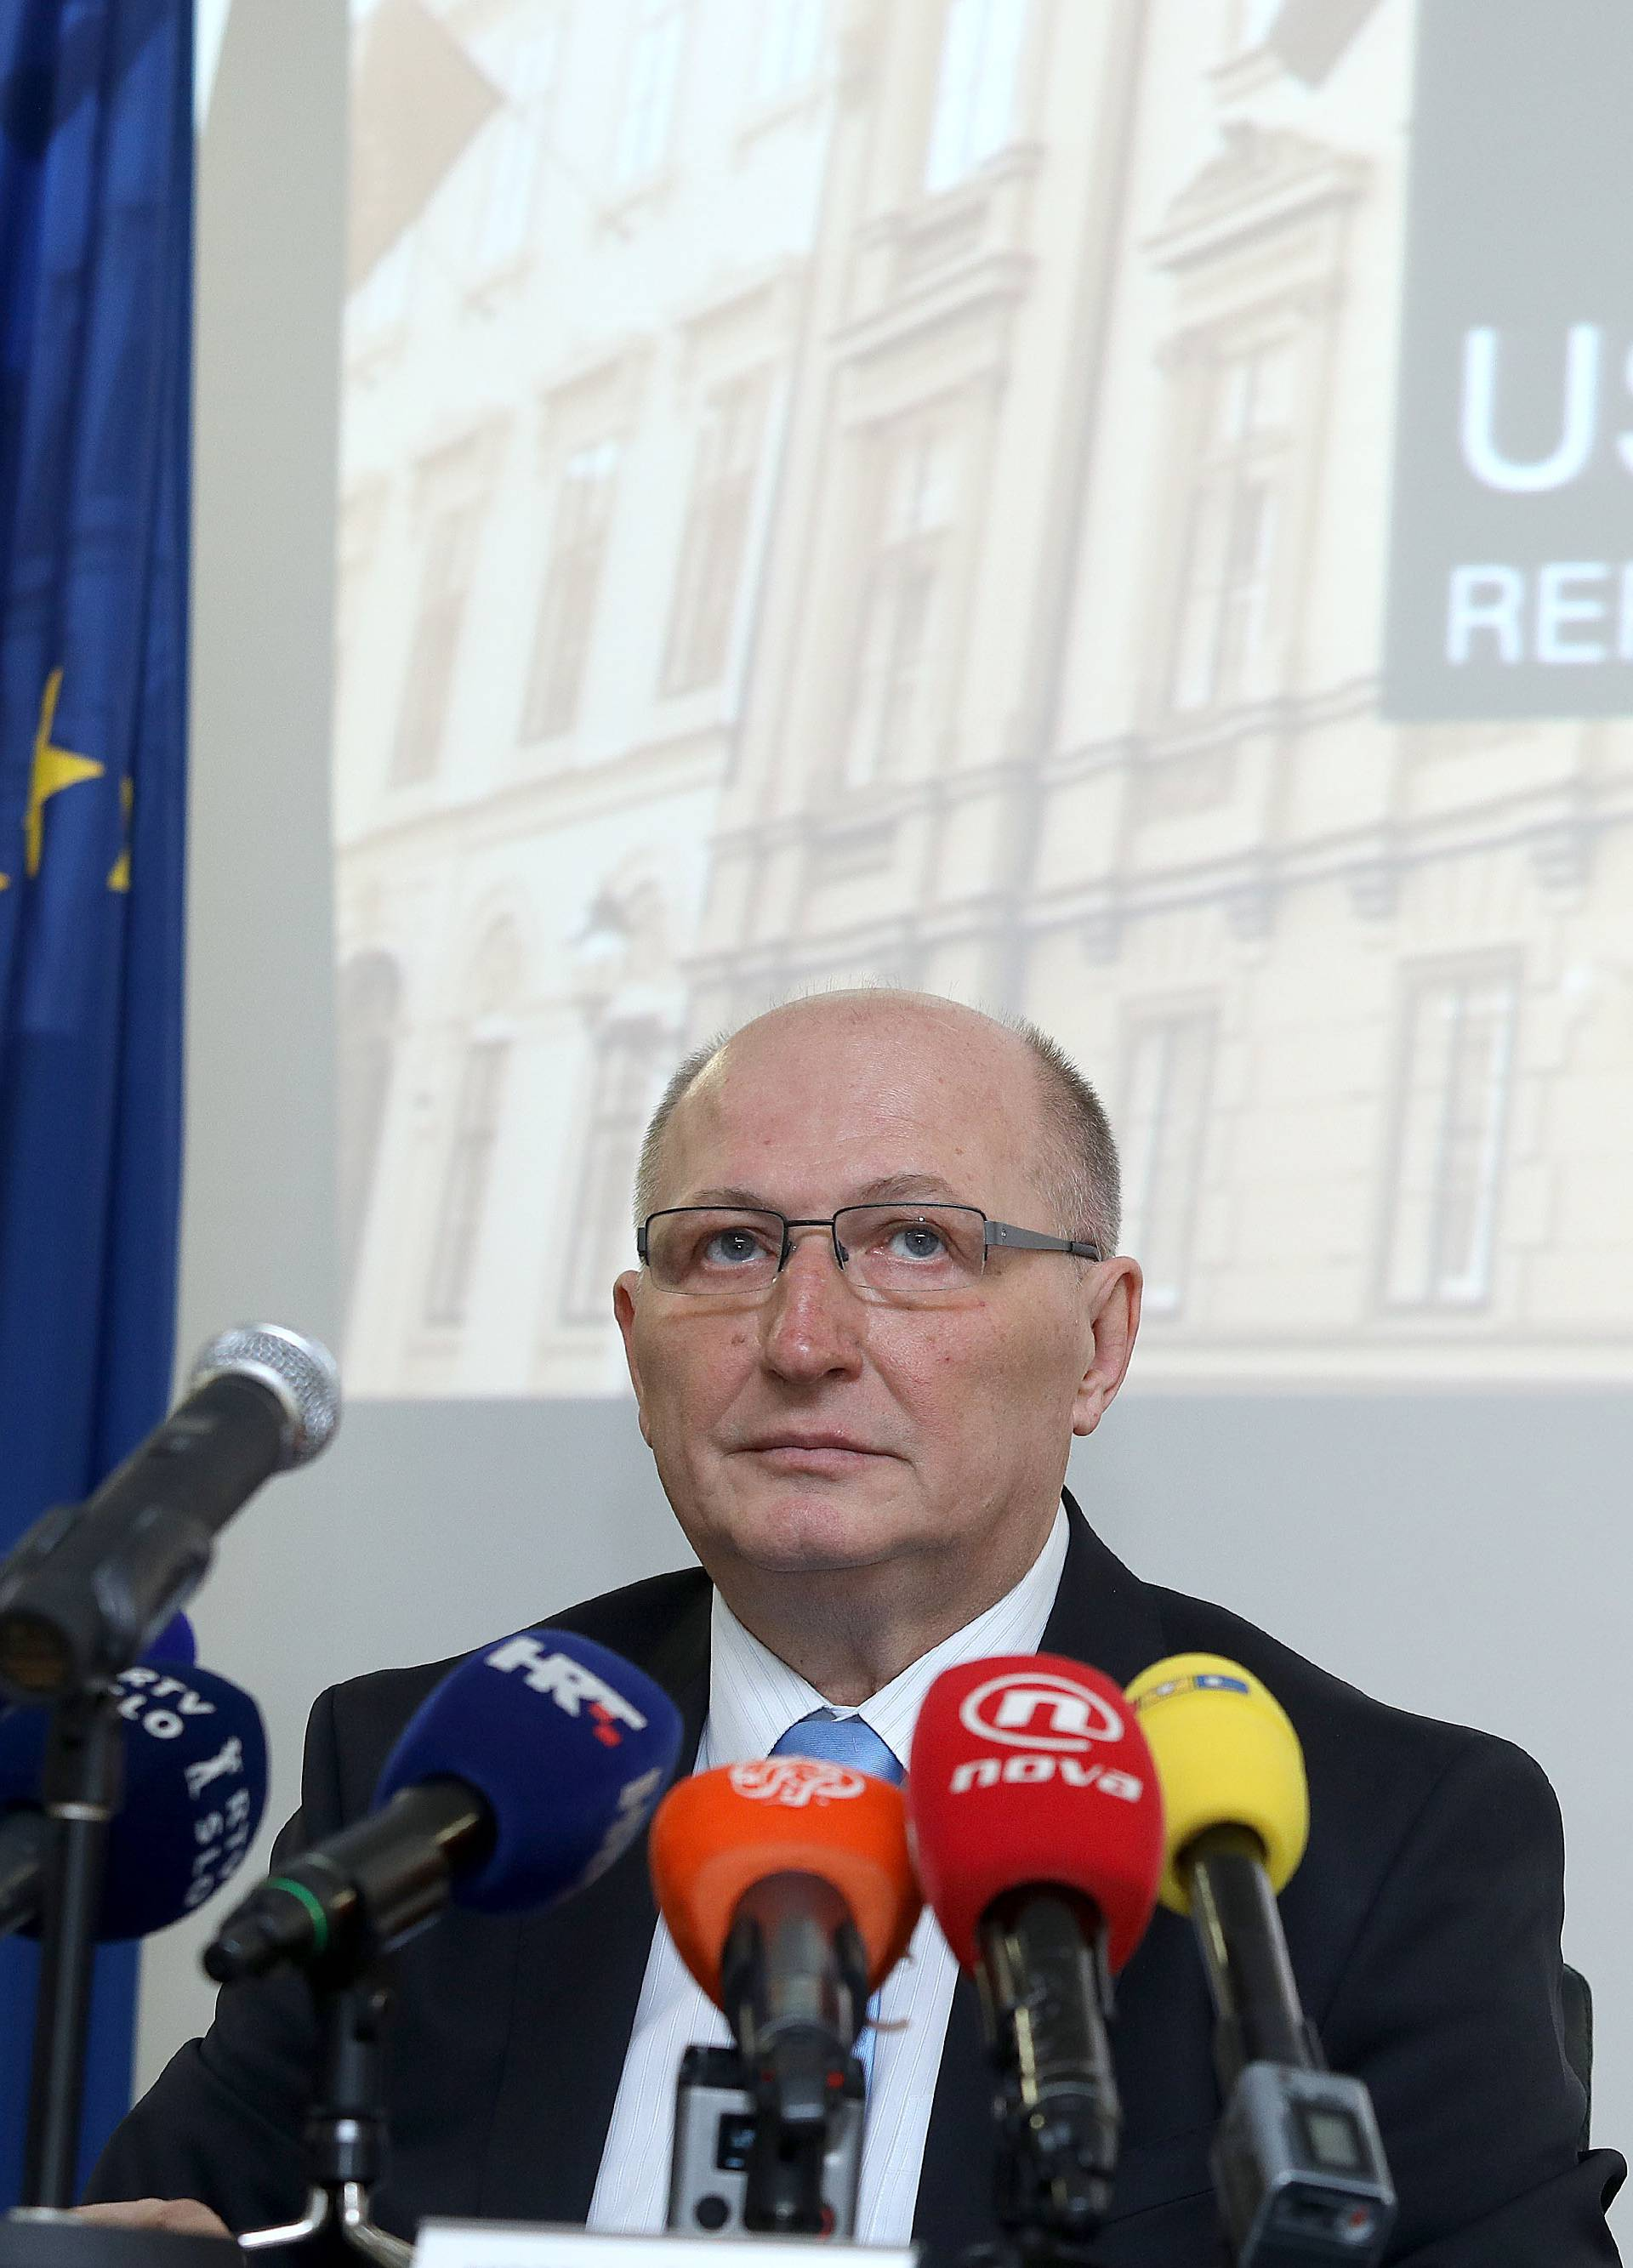 Miroslav Šeparović ide po novi mandat na čelu Ustavnog suda